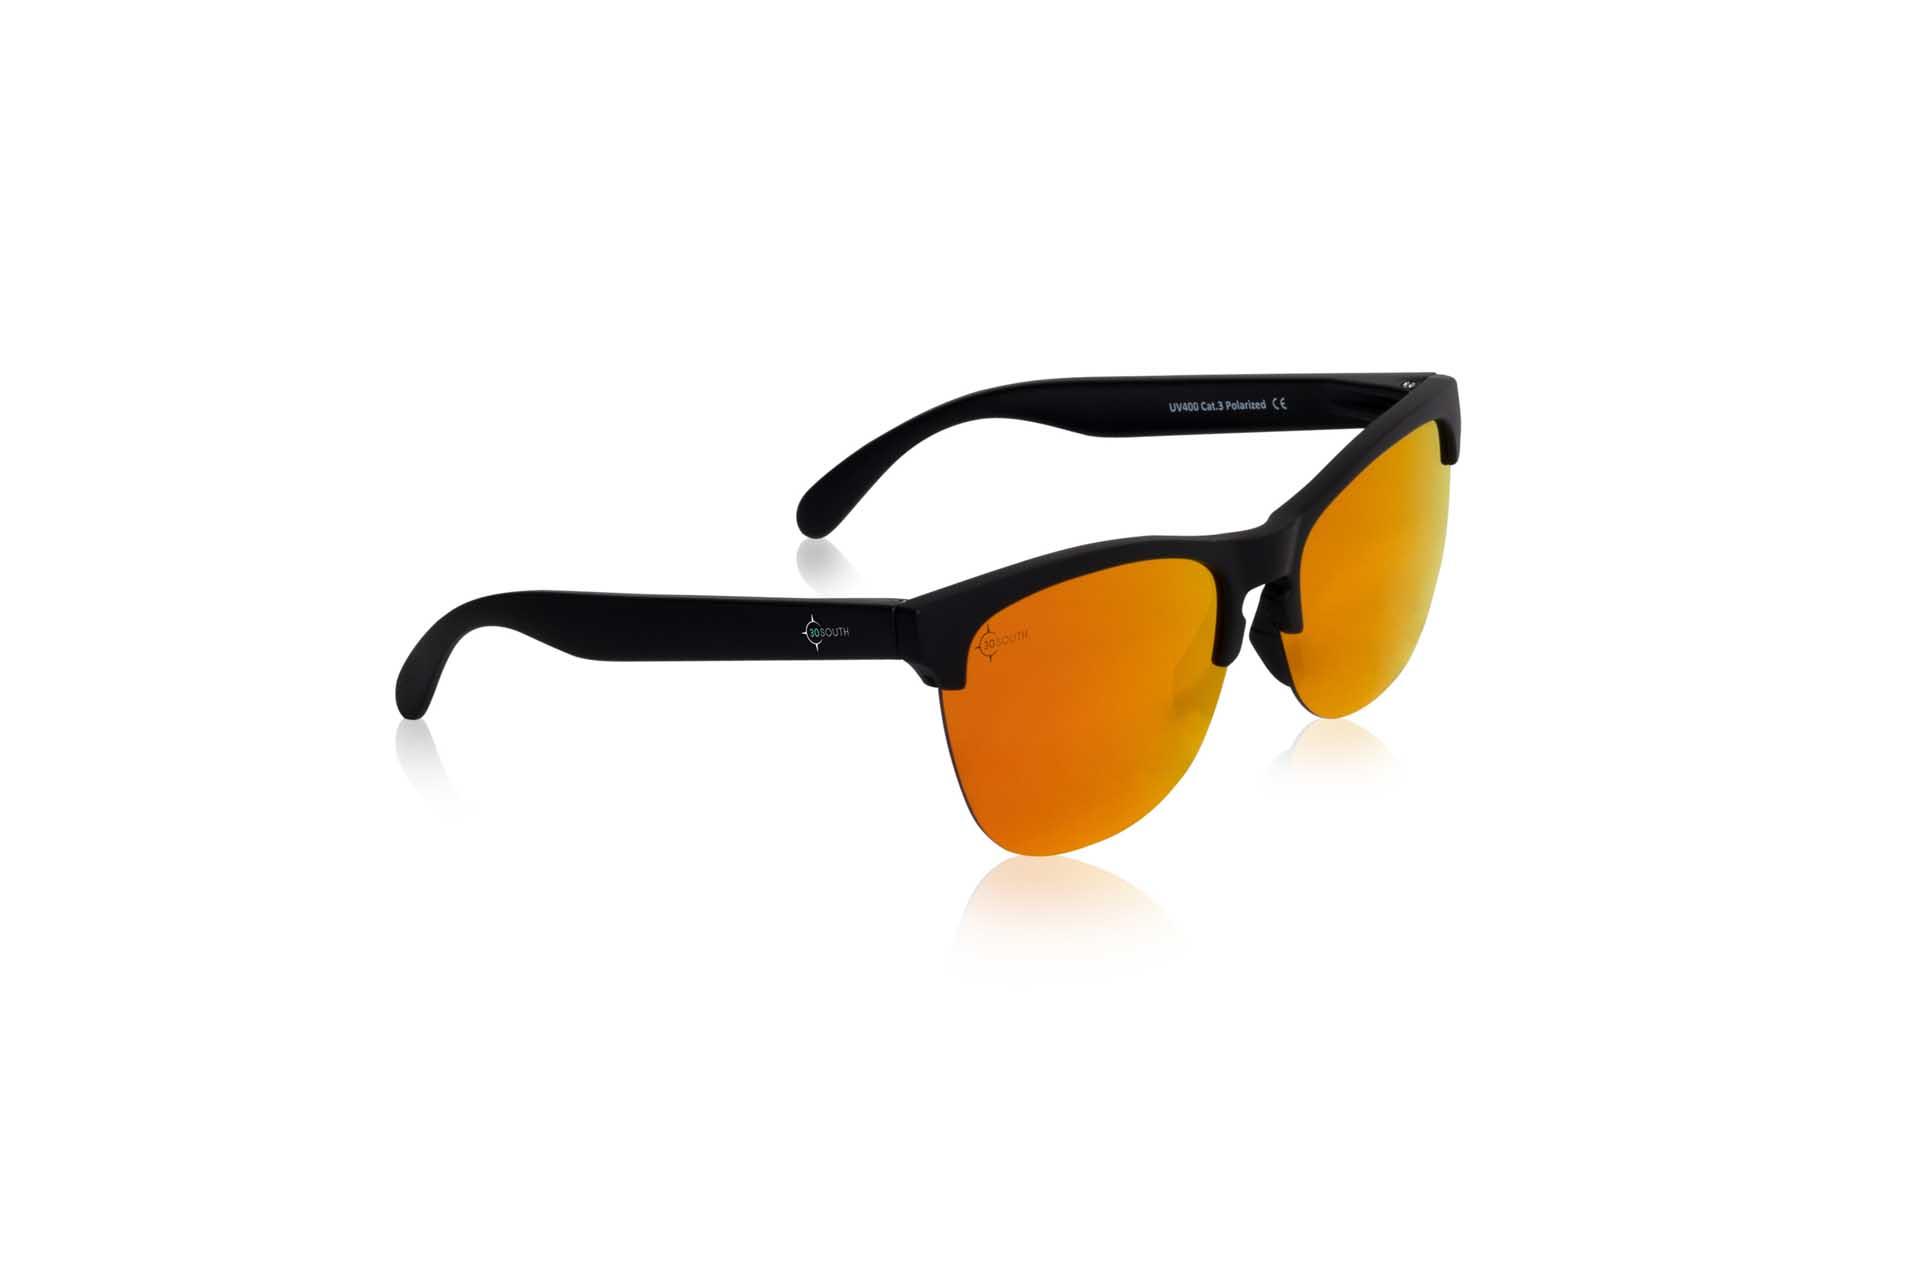 Photo of The Maverick Sunrise sunglasses